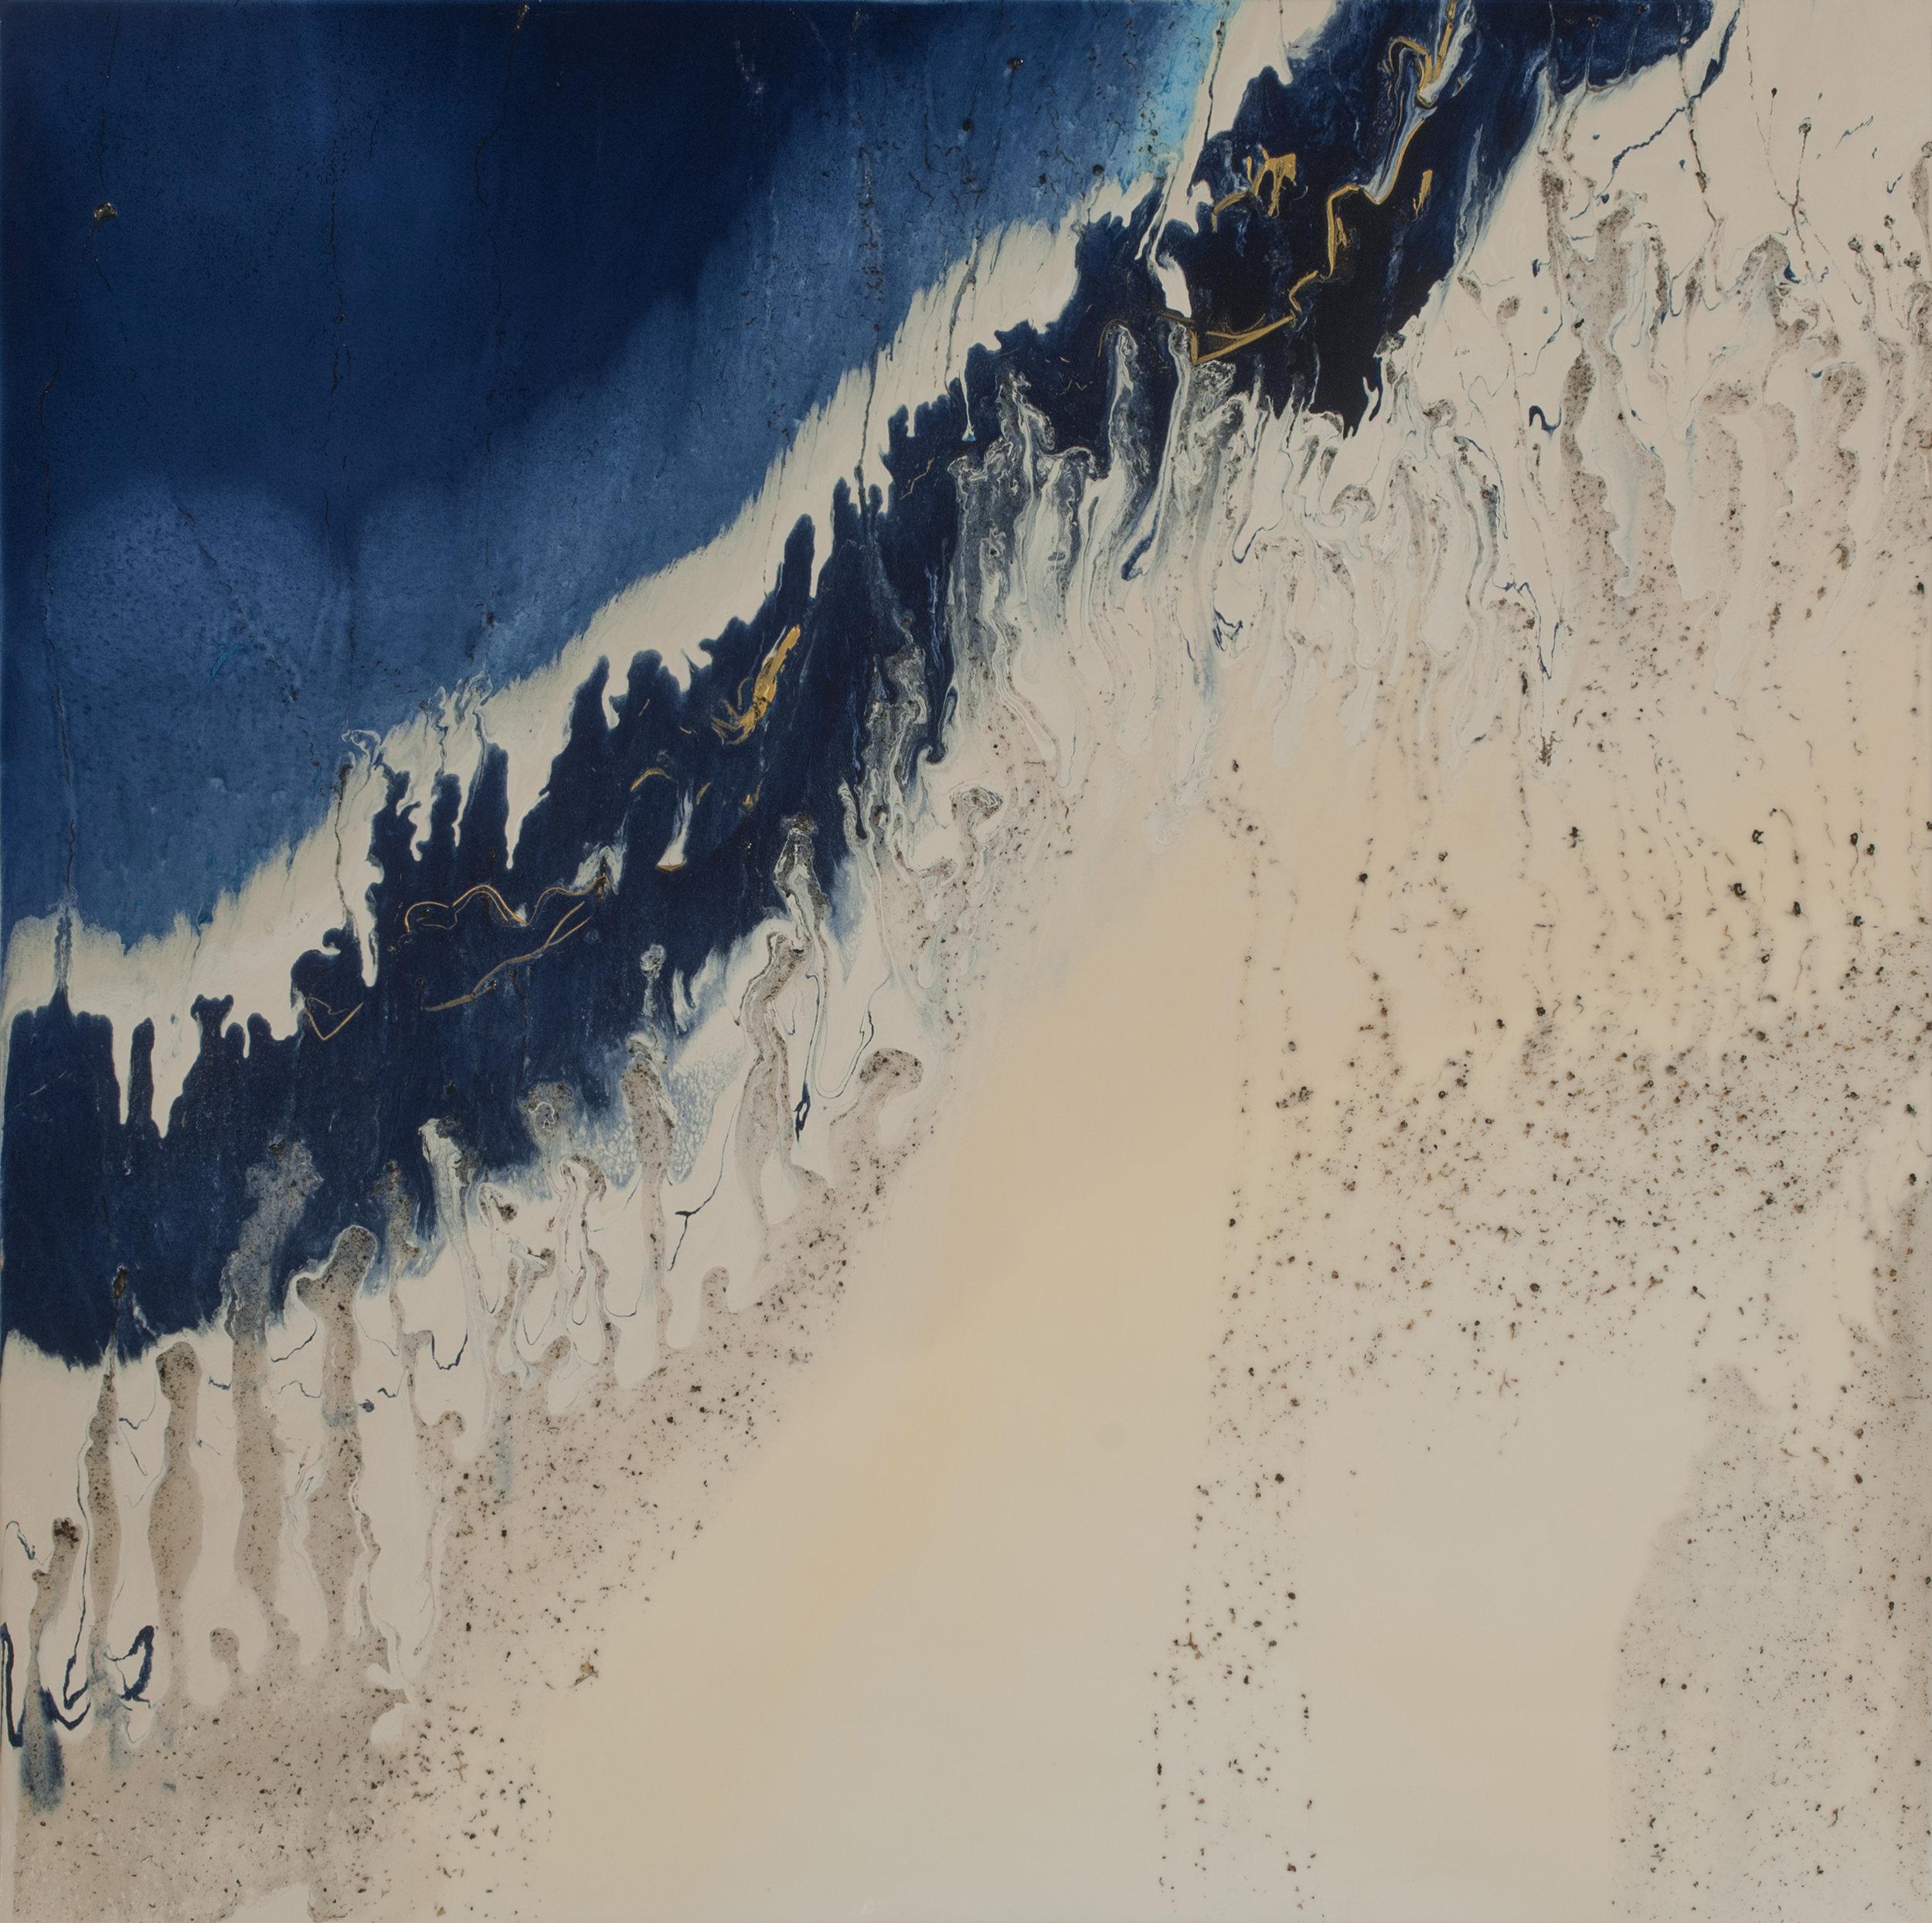 Sandcastle Blues  mixed media on panel  36 x 36 x 2